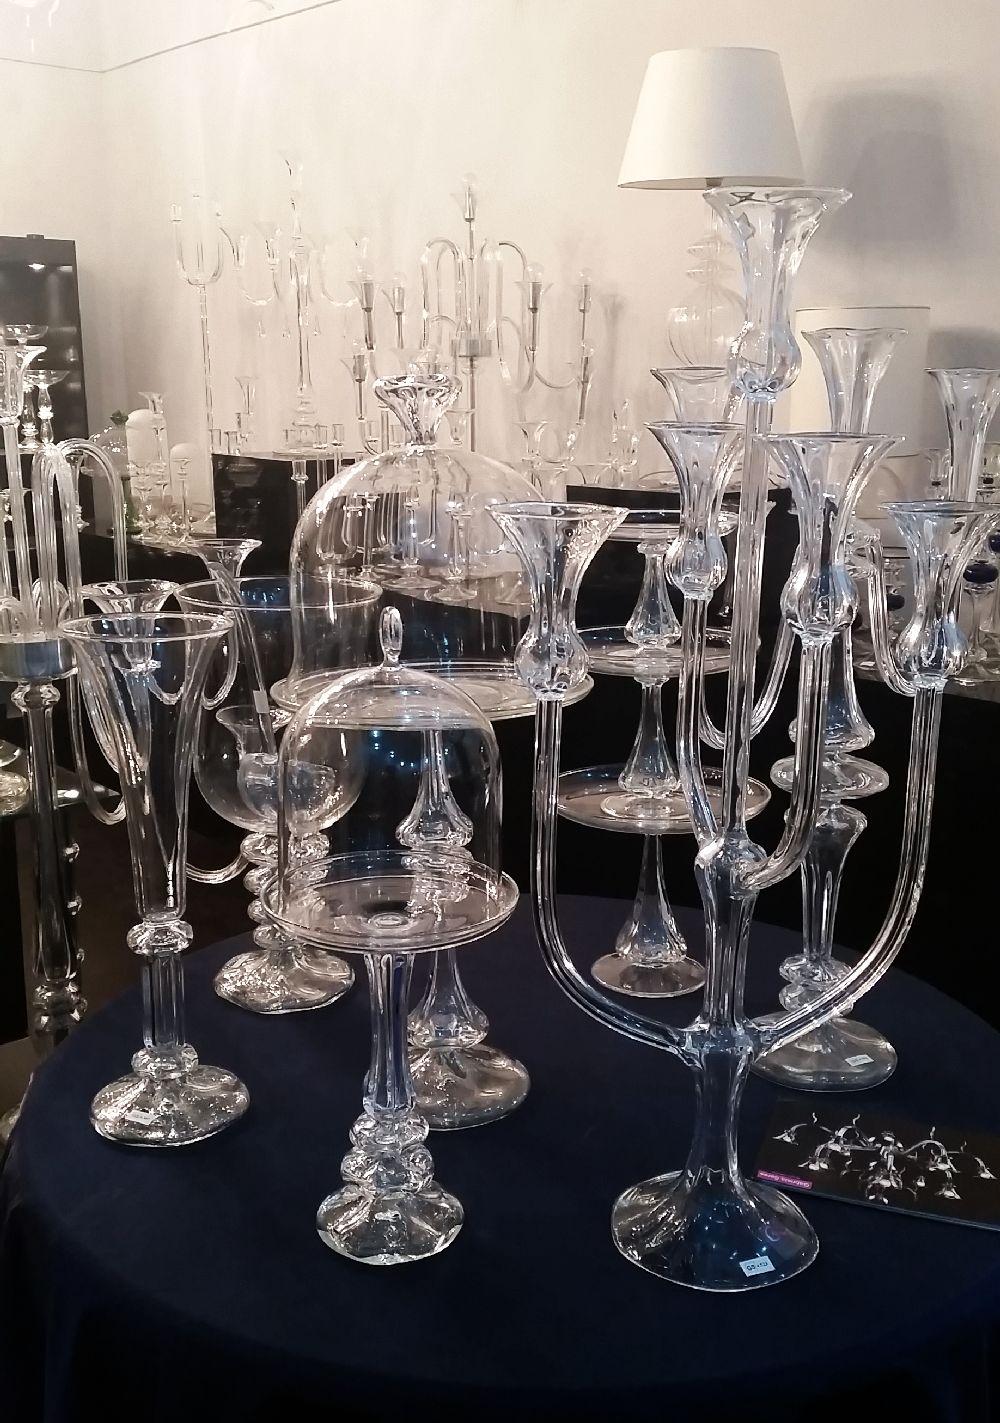 adelaparvu.com despre atelierul de sticlarie Gabriela Seres (4)